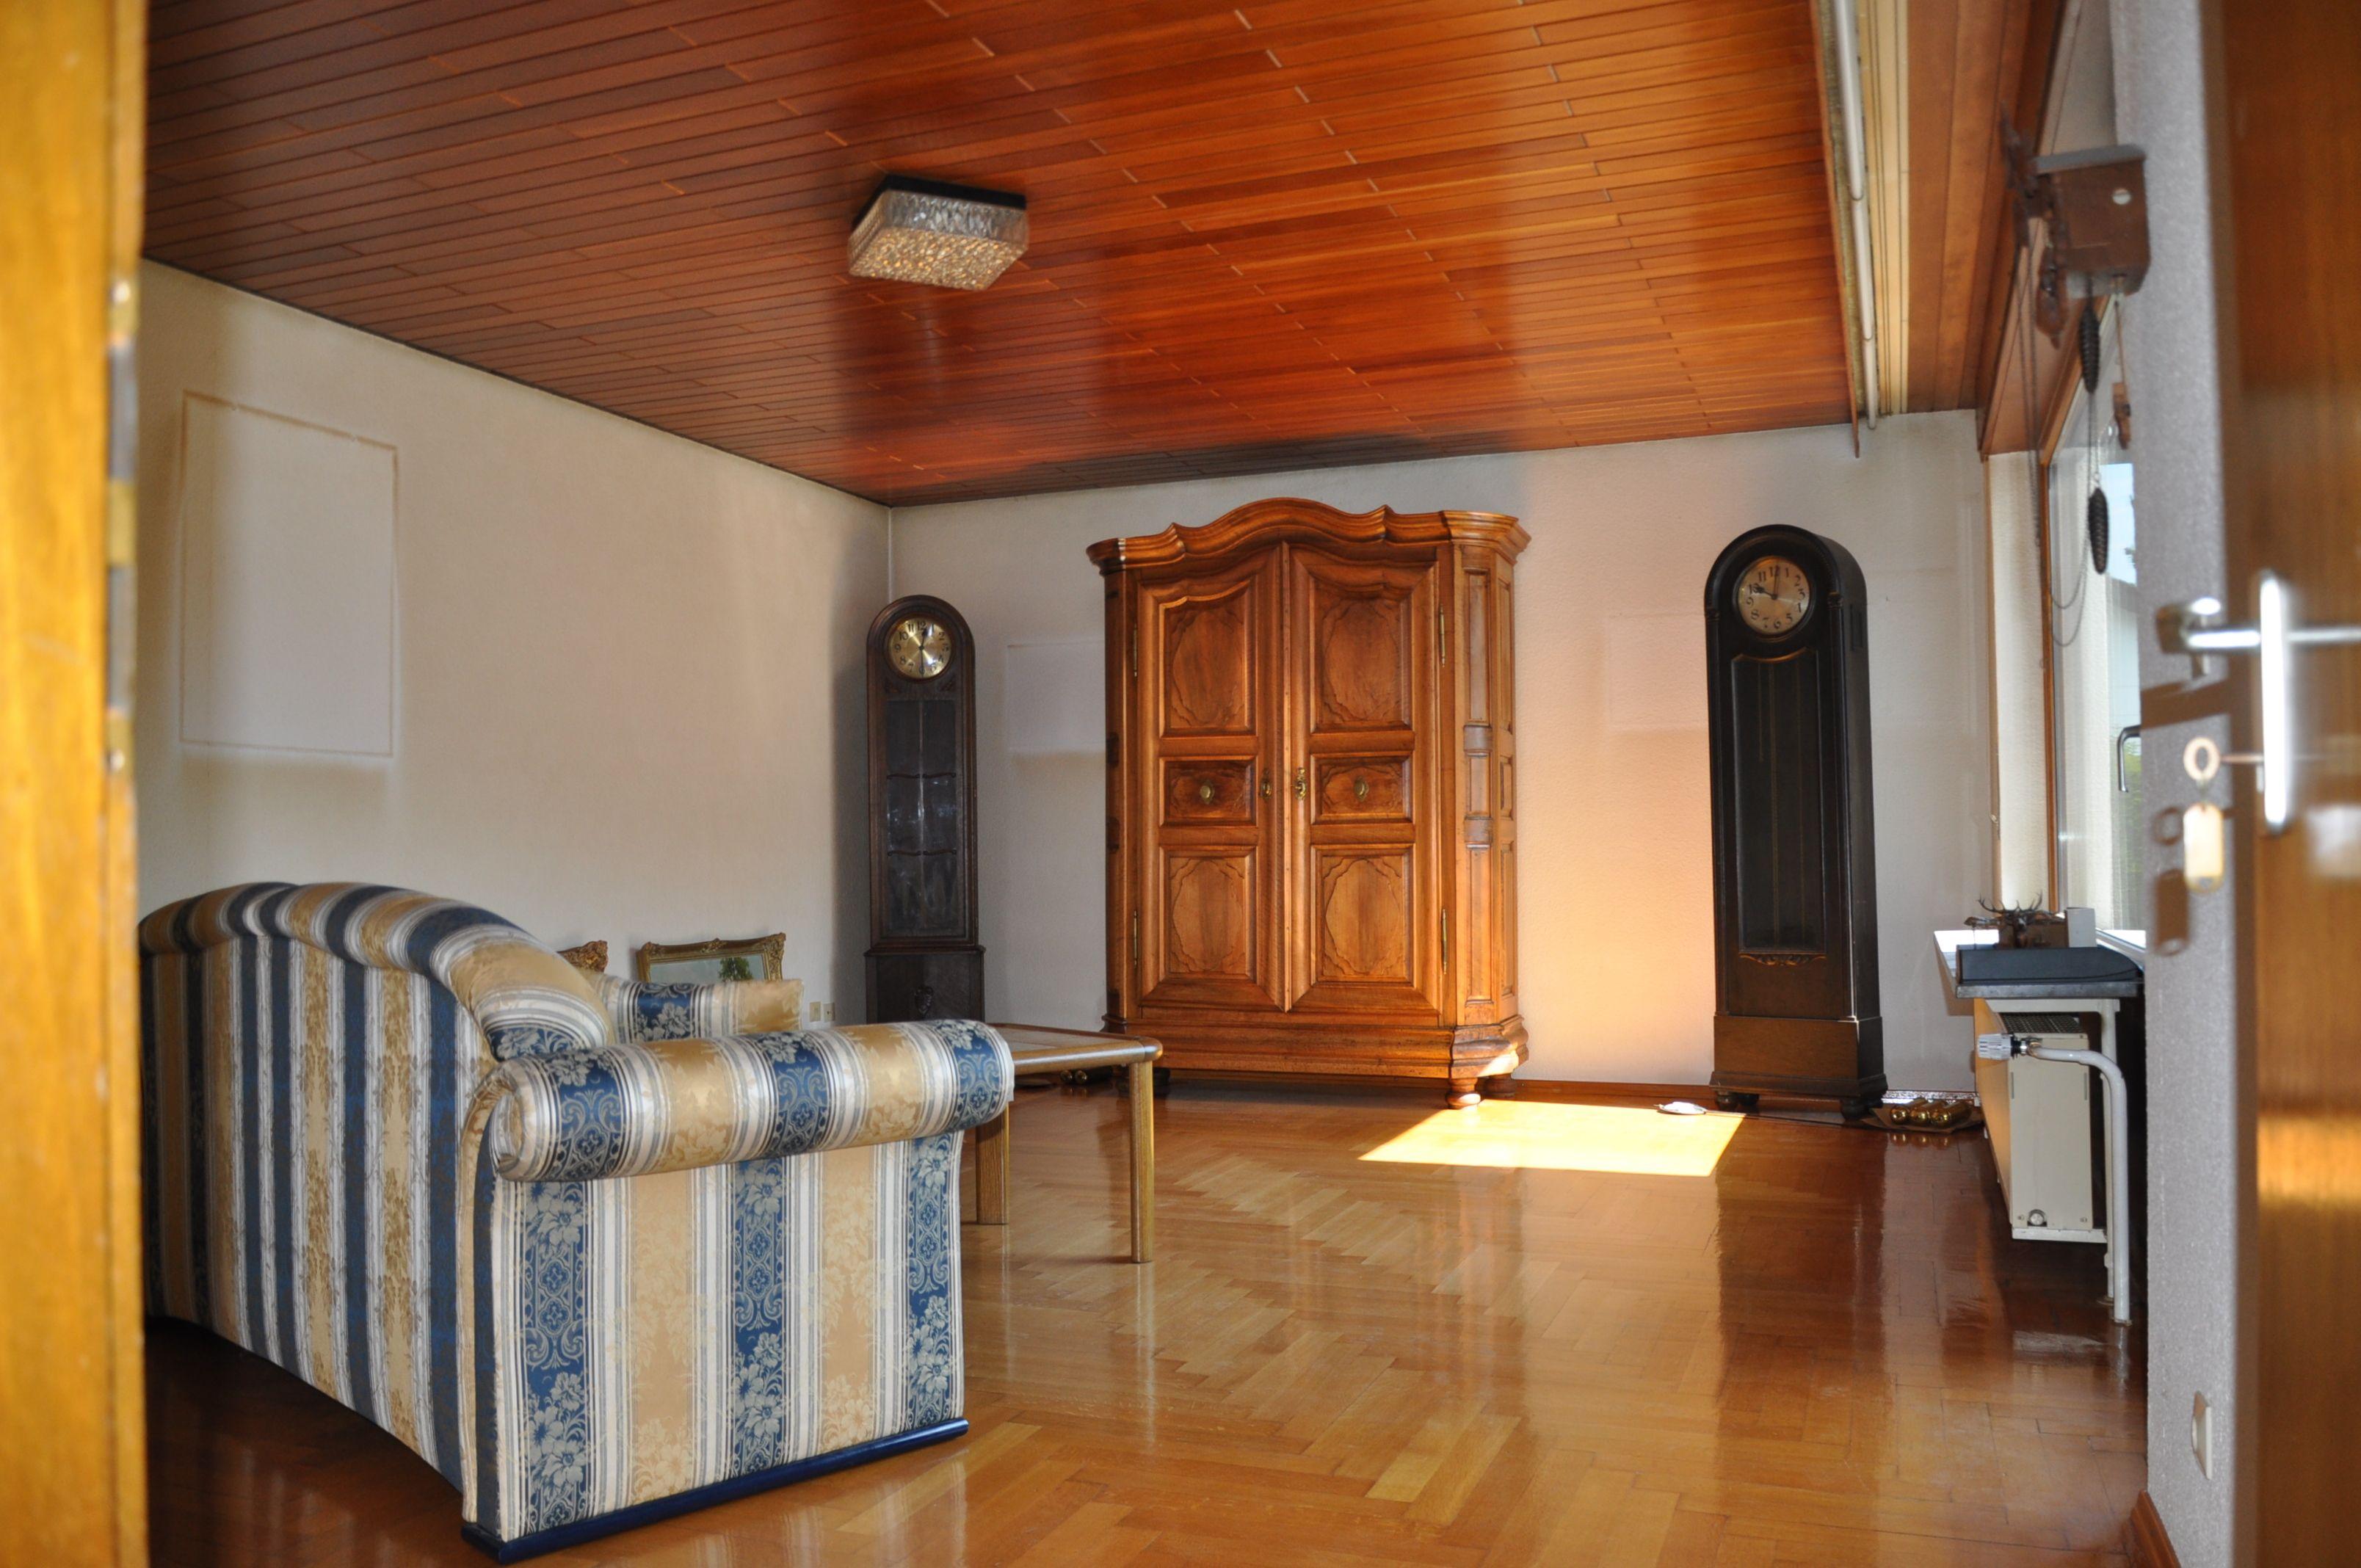 Wohnzimmer Karlsruhe ~ Familienhaus in karlsruhe: wohnzimmer großzügiges familienhaus